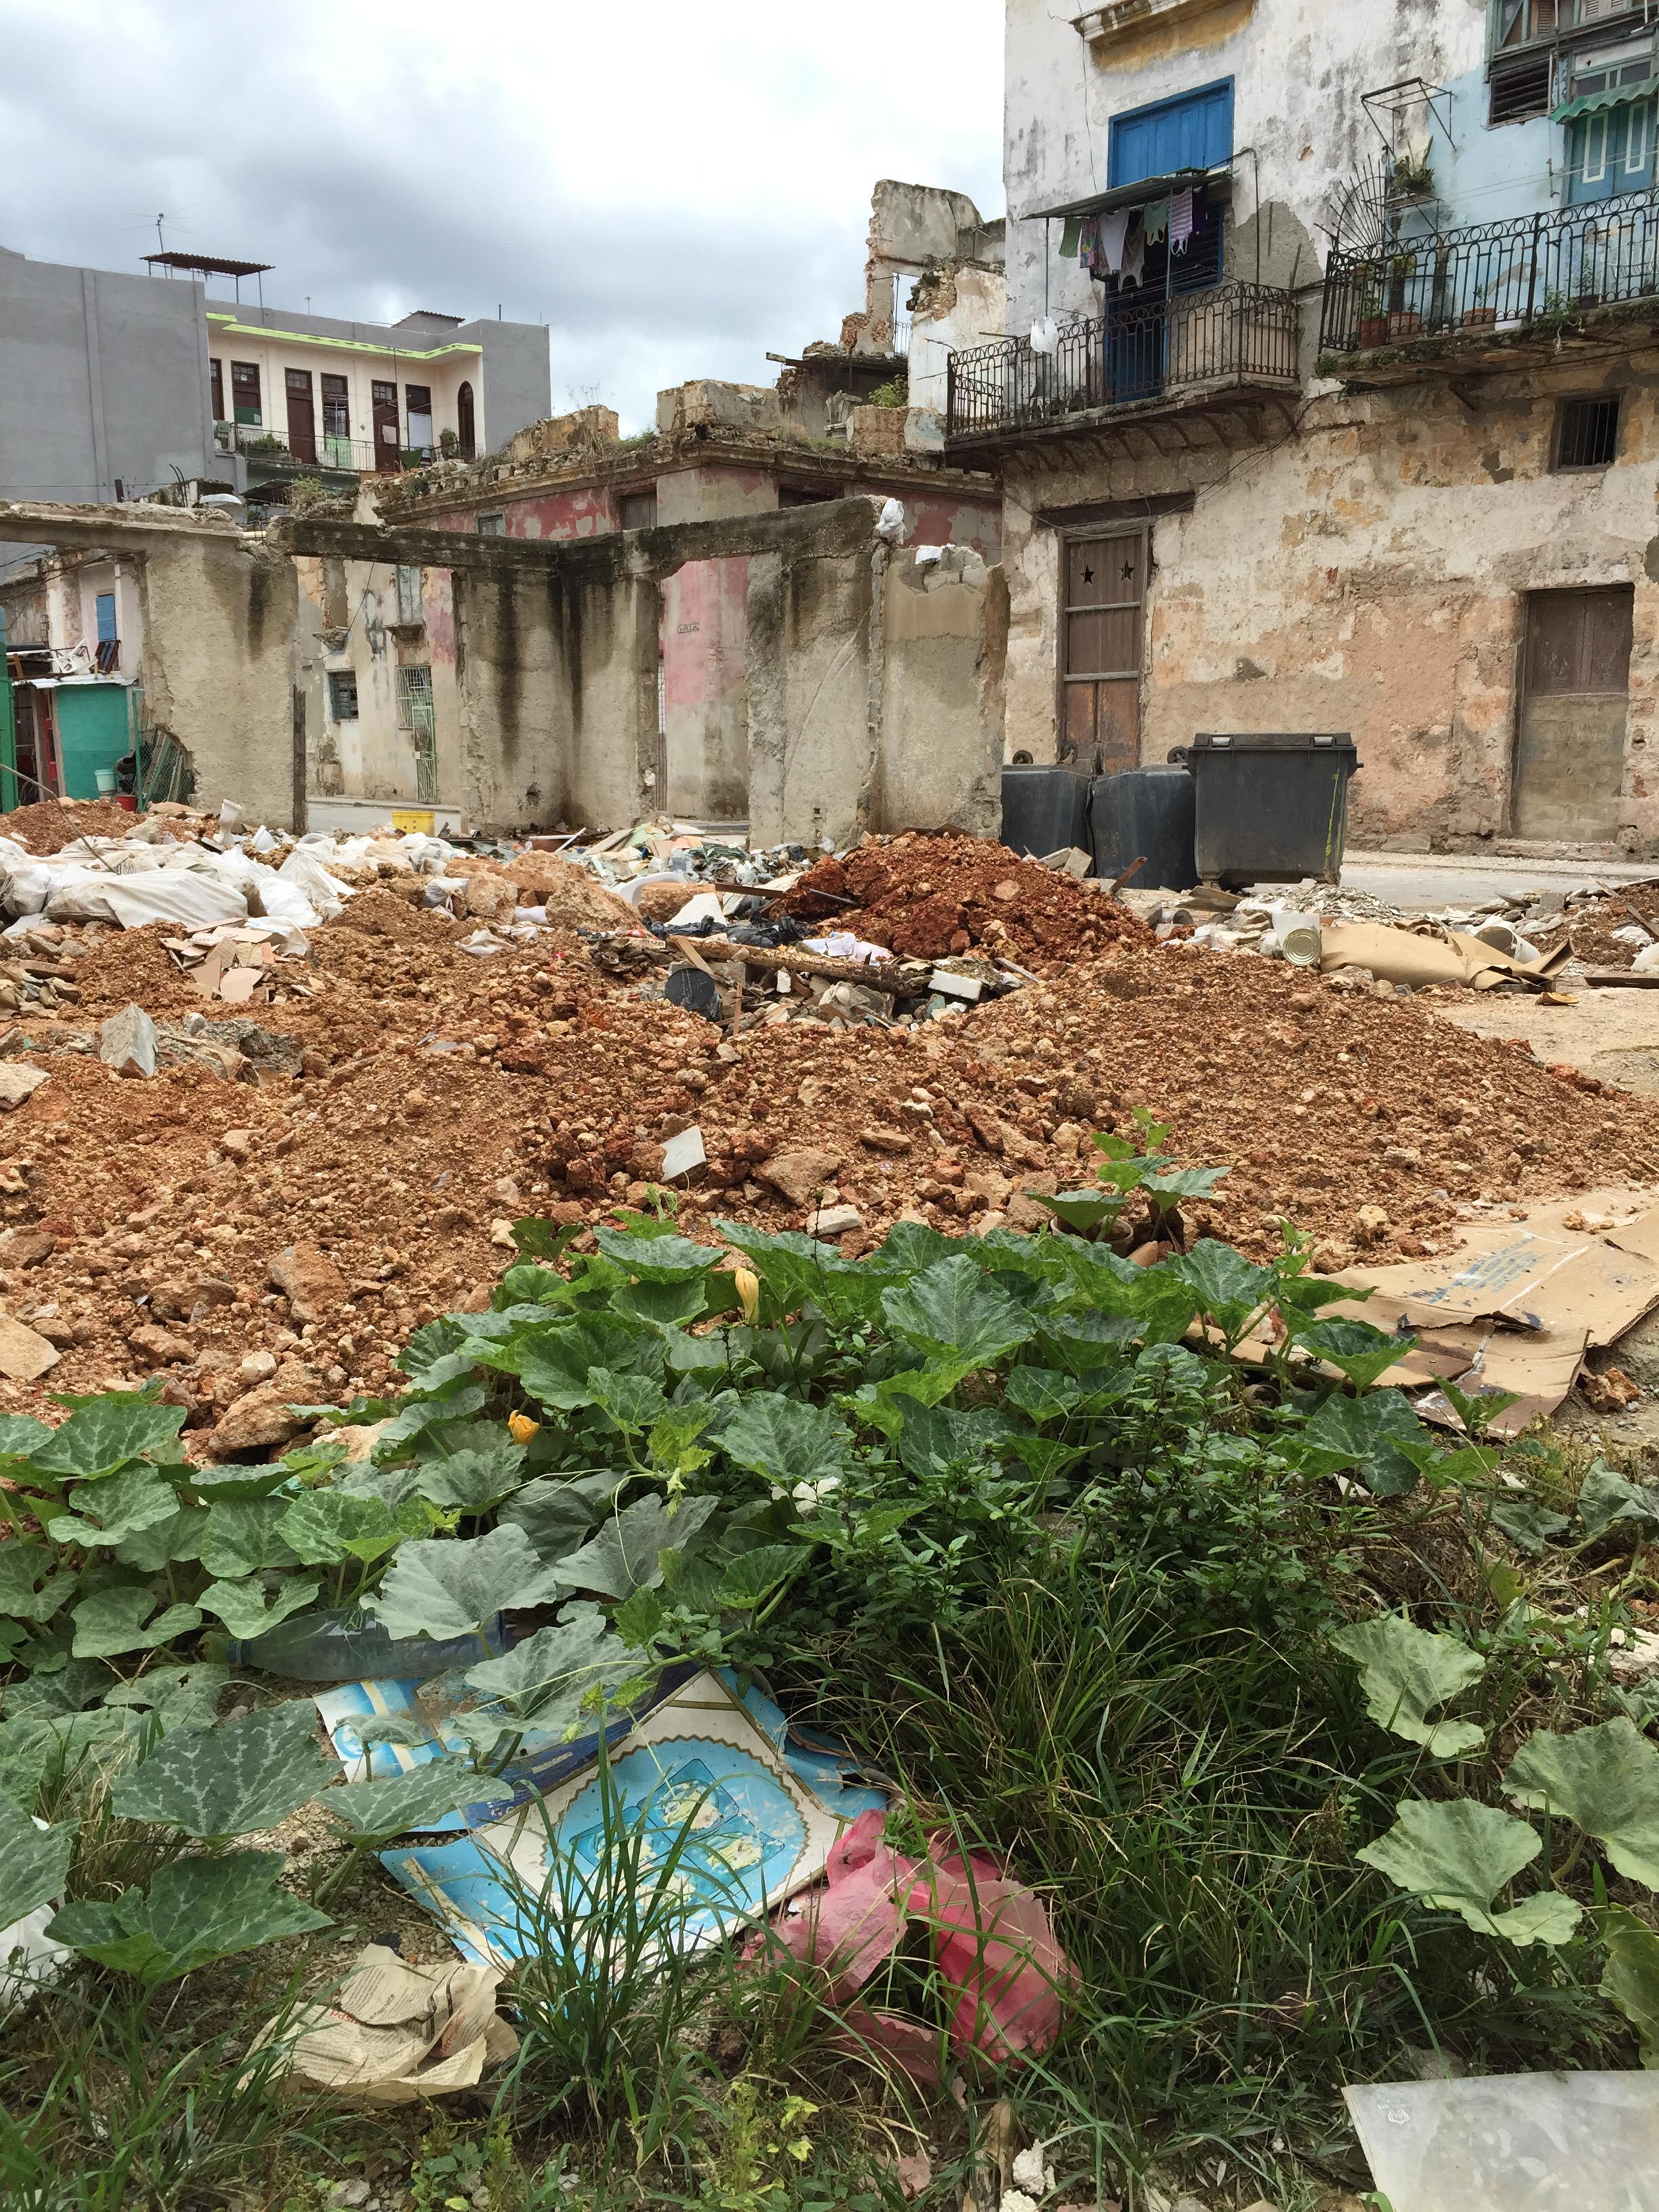 Compost Garden. Vegatables growing in a dump sight. Old Havana, Cuba, 2016